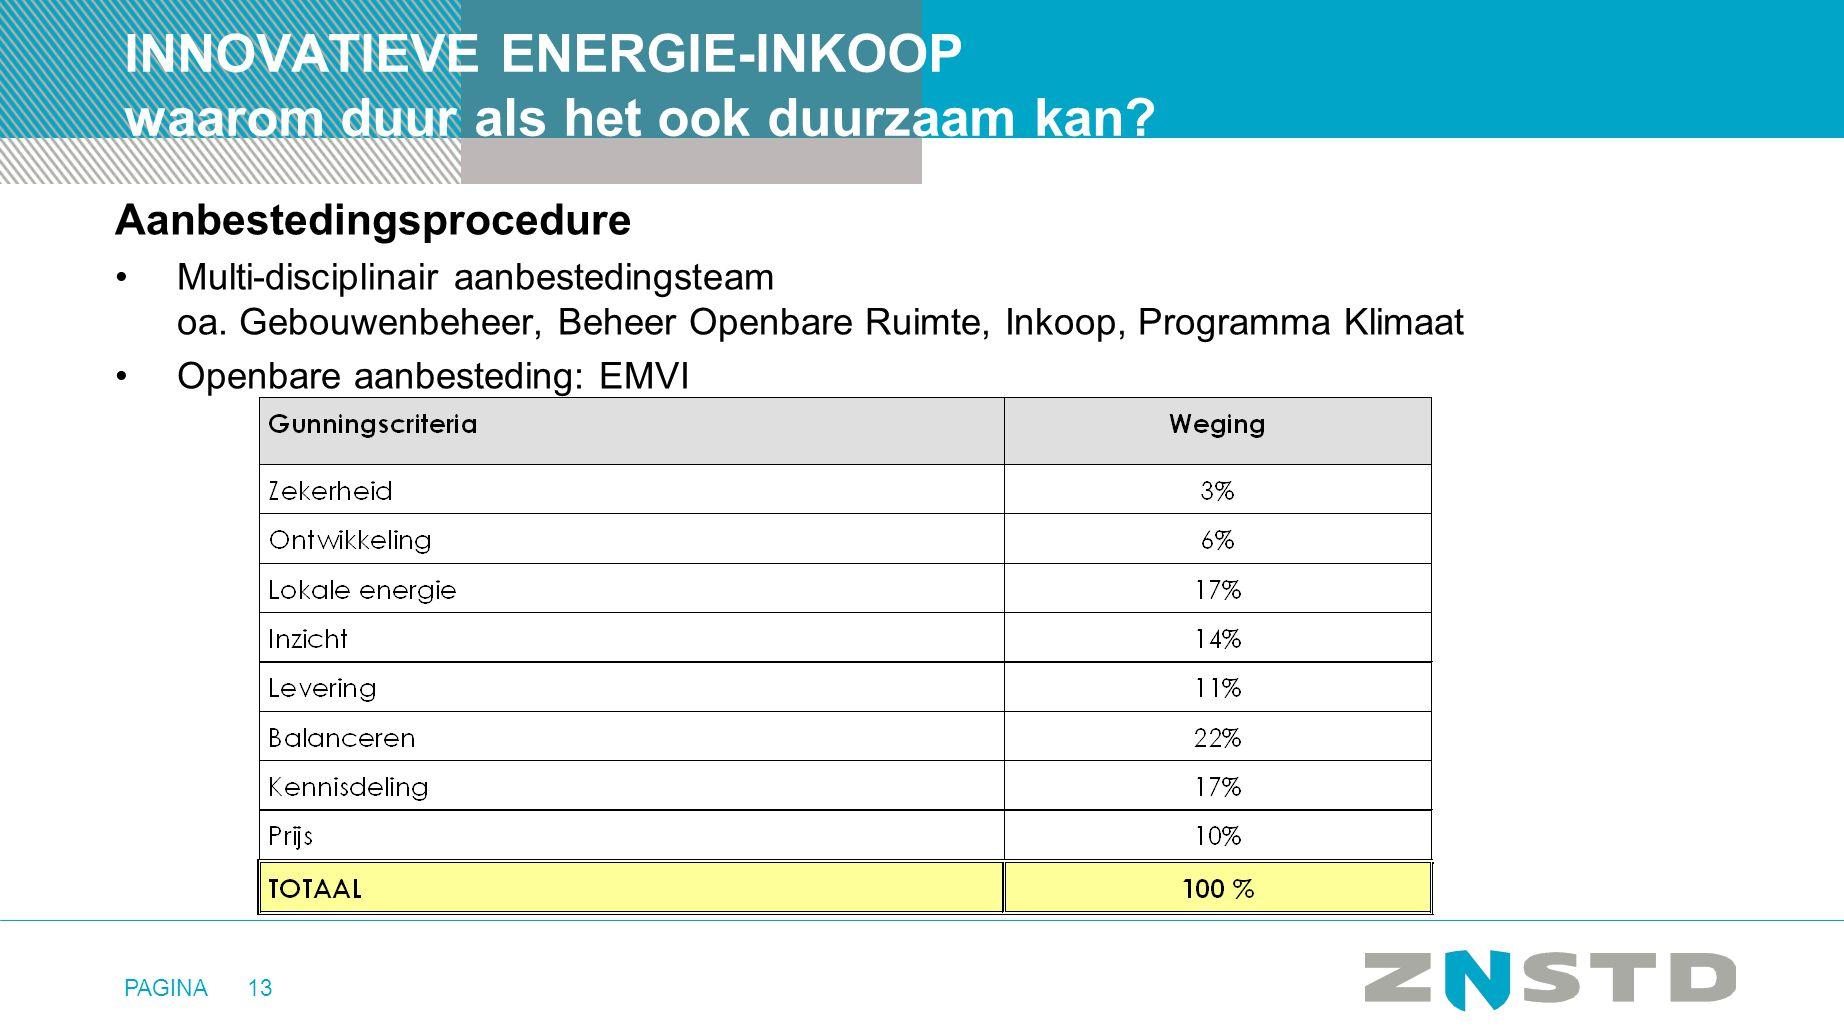 PAGINA13 INNOVATIEVE ENERGIE-INKOOP waarom duur als het ook duurzaam kan? Aanbestedingsprocedure •Multi-disciplinair aanbestedingsteam oa. Gebouwenbeh